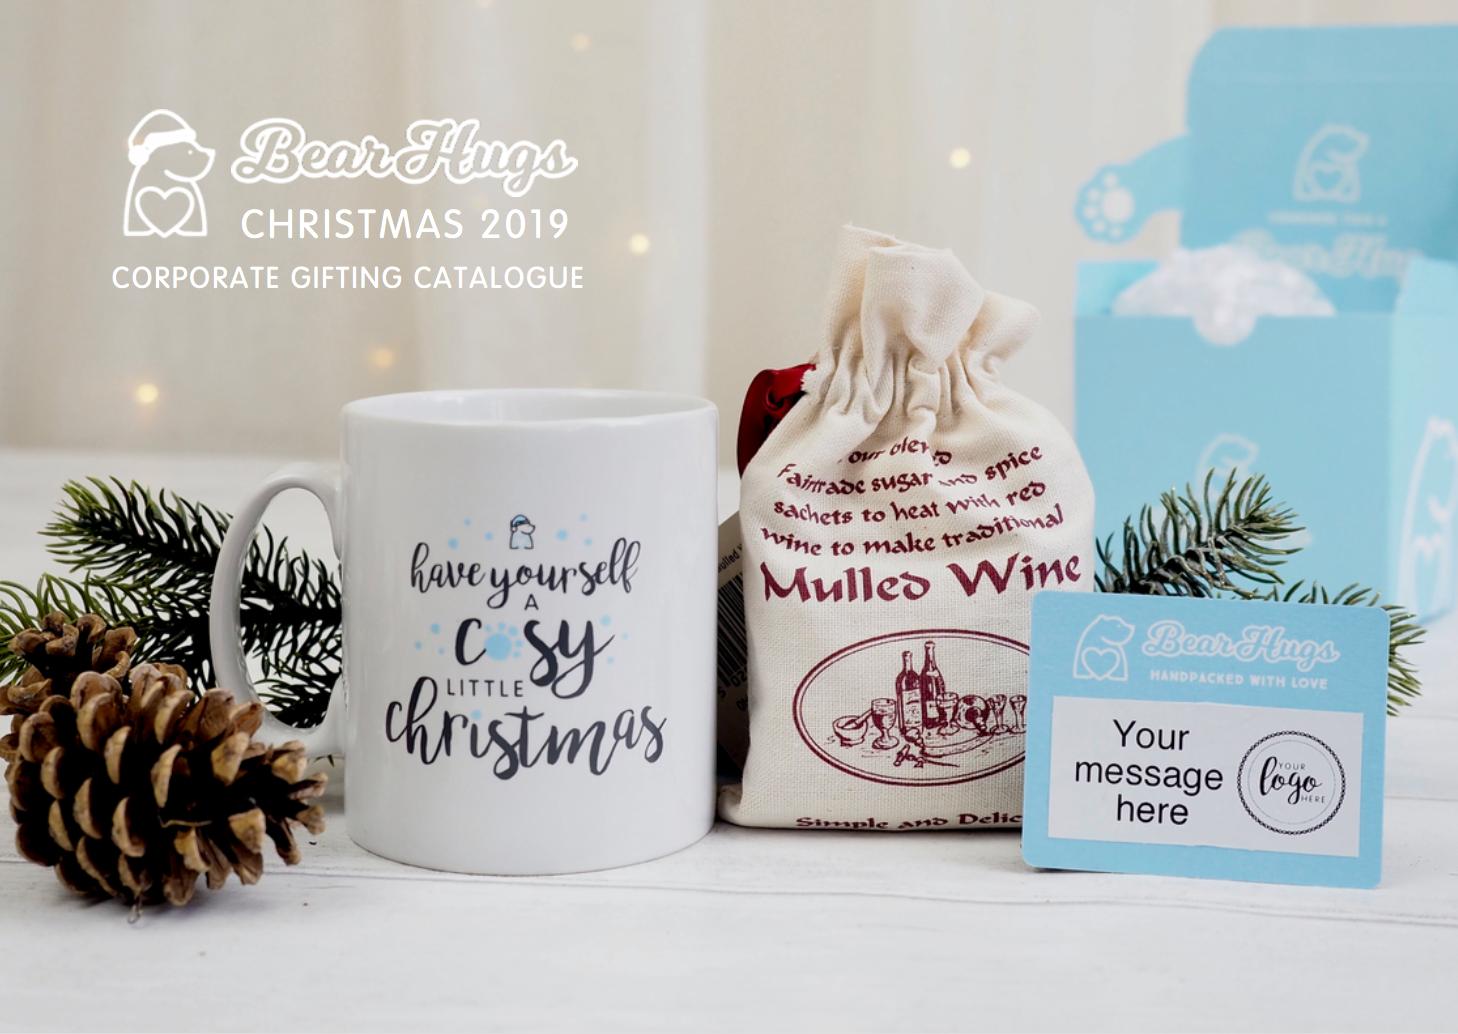 bearhugs corporate christmas gifting catalogue 2019.png